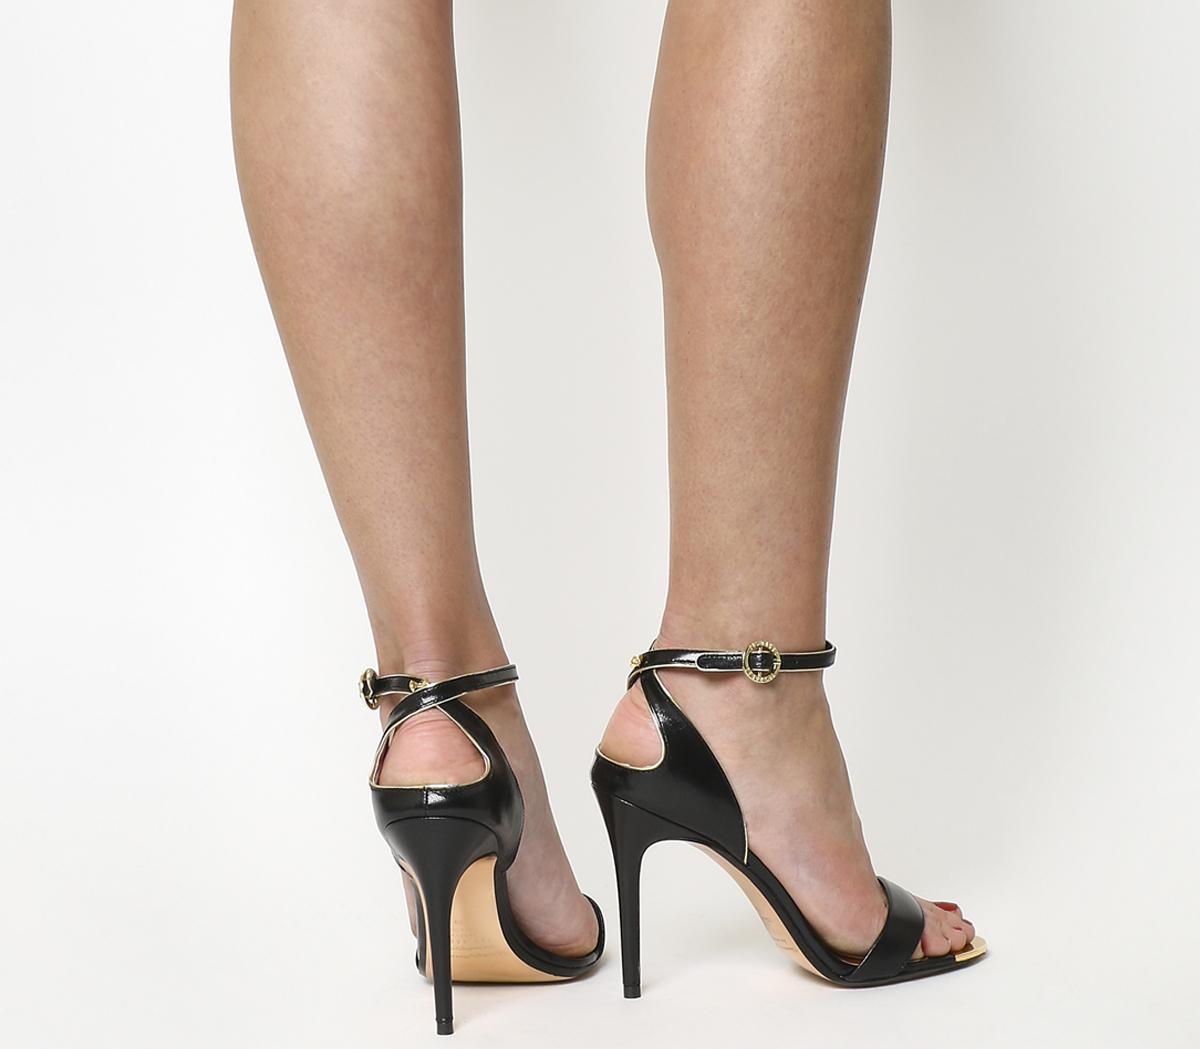 f505e2af8 Ted Baker Mirobell Strappy Heels Black Leather - High Heels